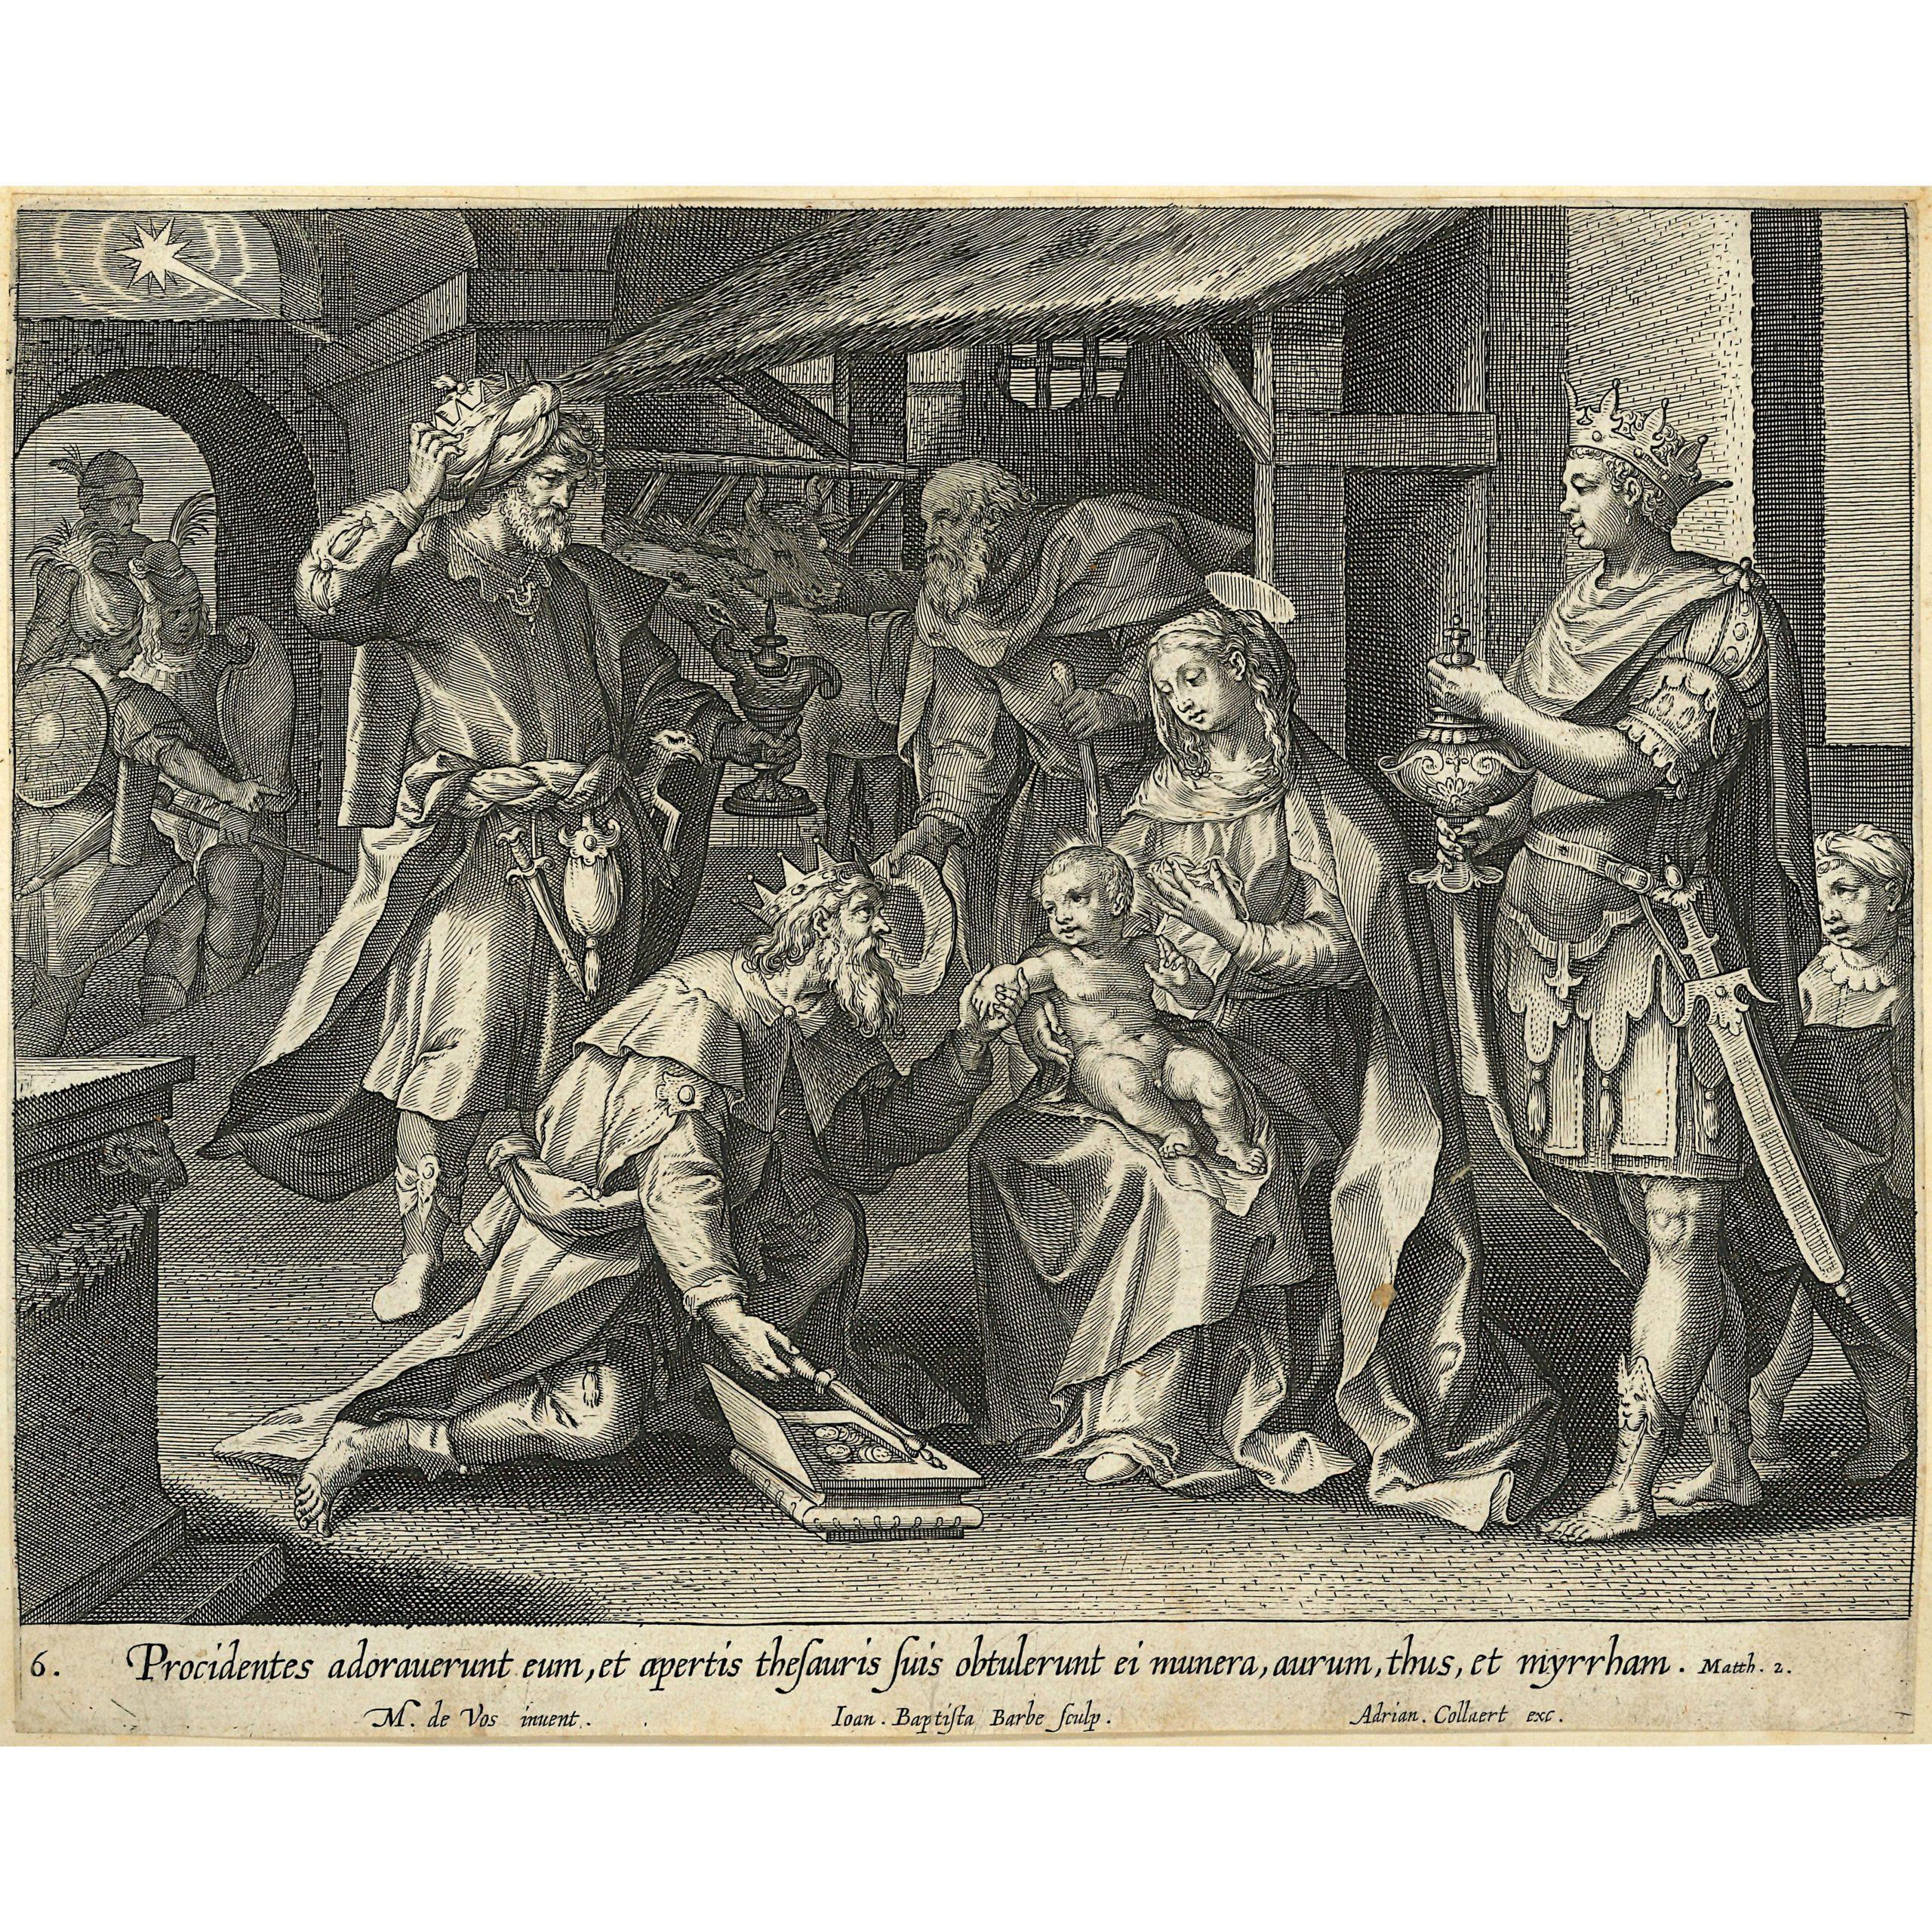 Adrian Collaert 17th Century engraving Martin de Vos The Visitation of the Magi